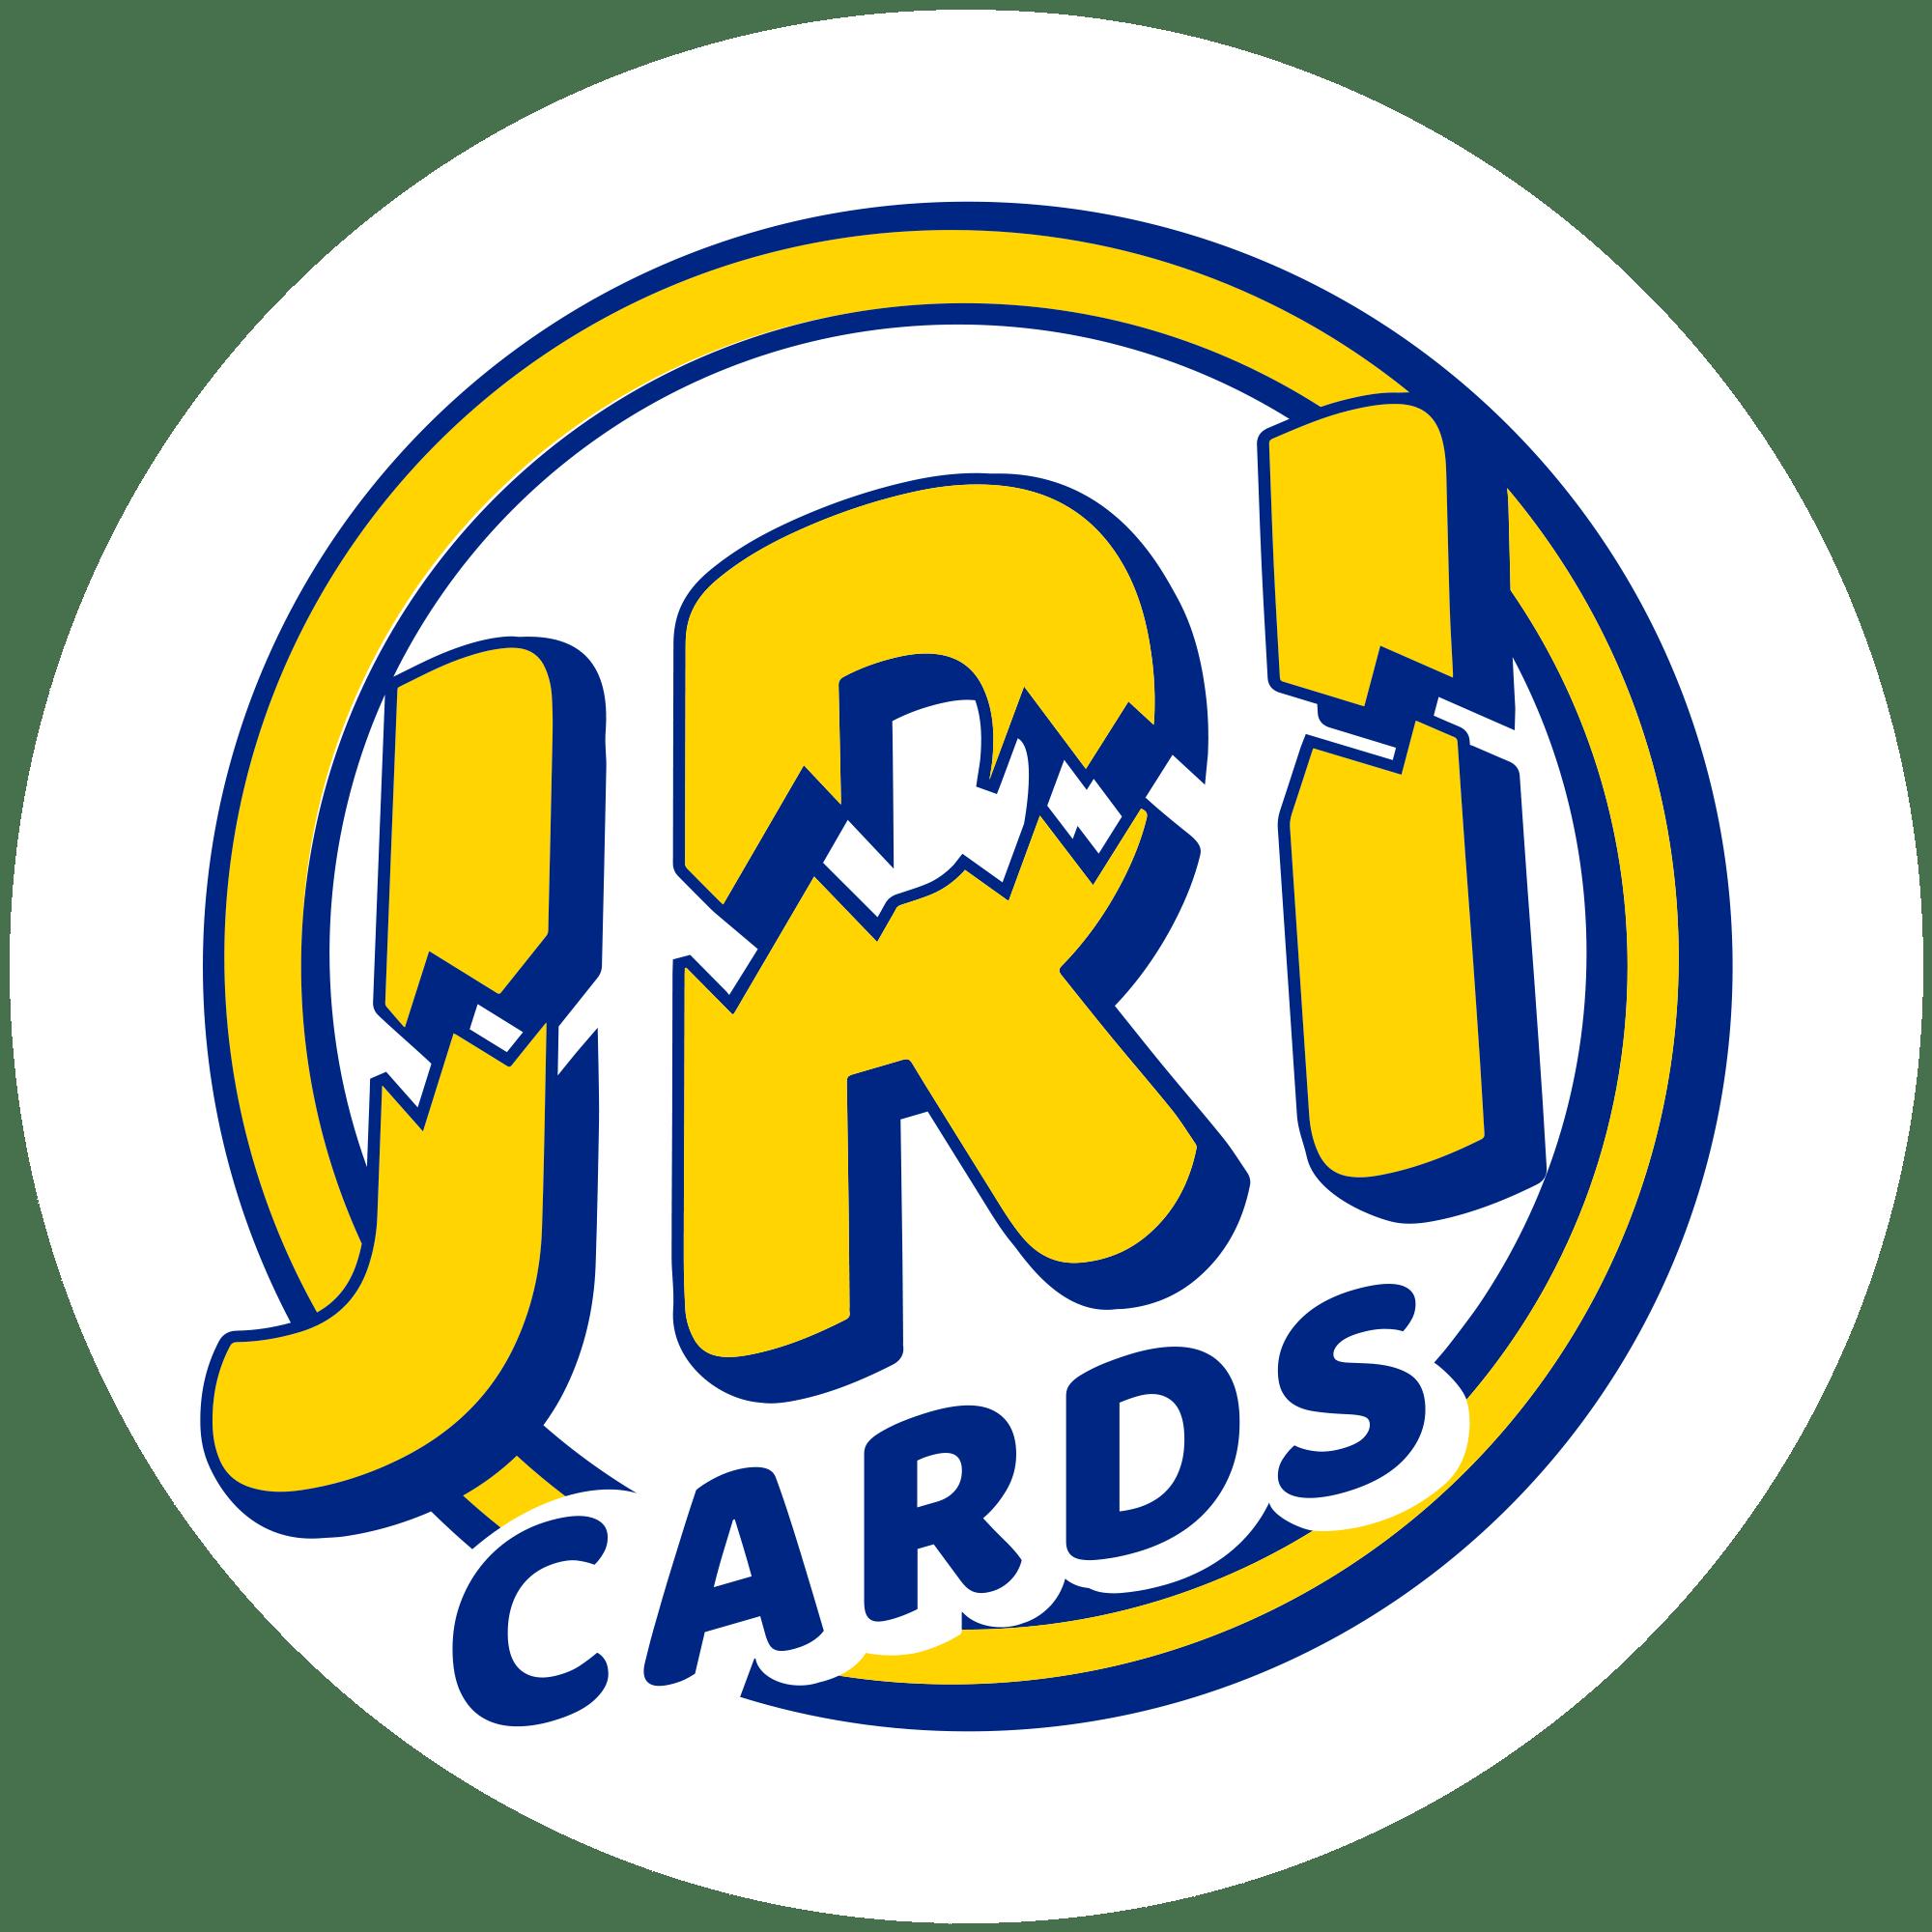 2021 PANINI CONTENDERS FOOTBALL DRAFT PICKS HOBBY BOX (6 PACKS AVAILABLE)